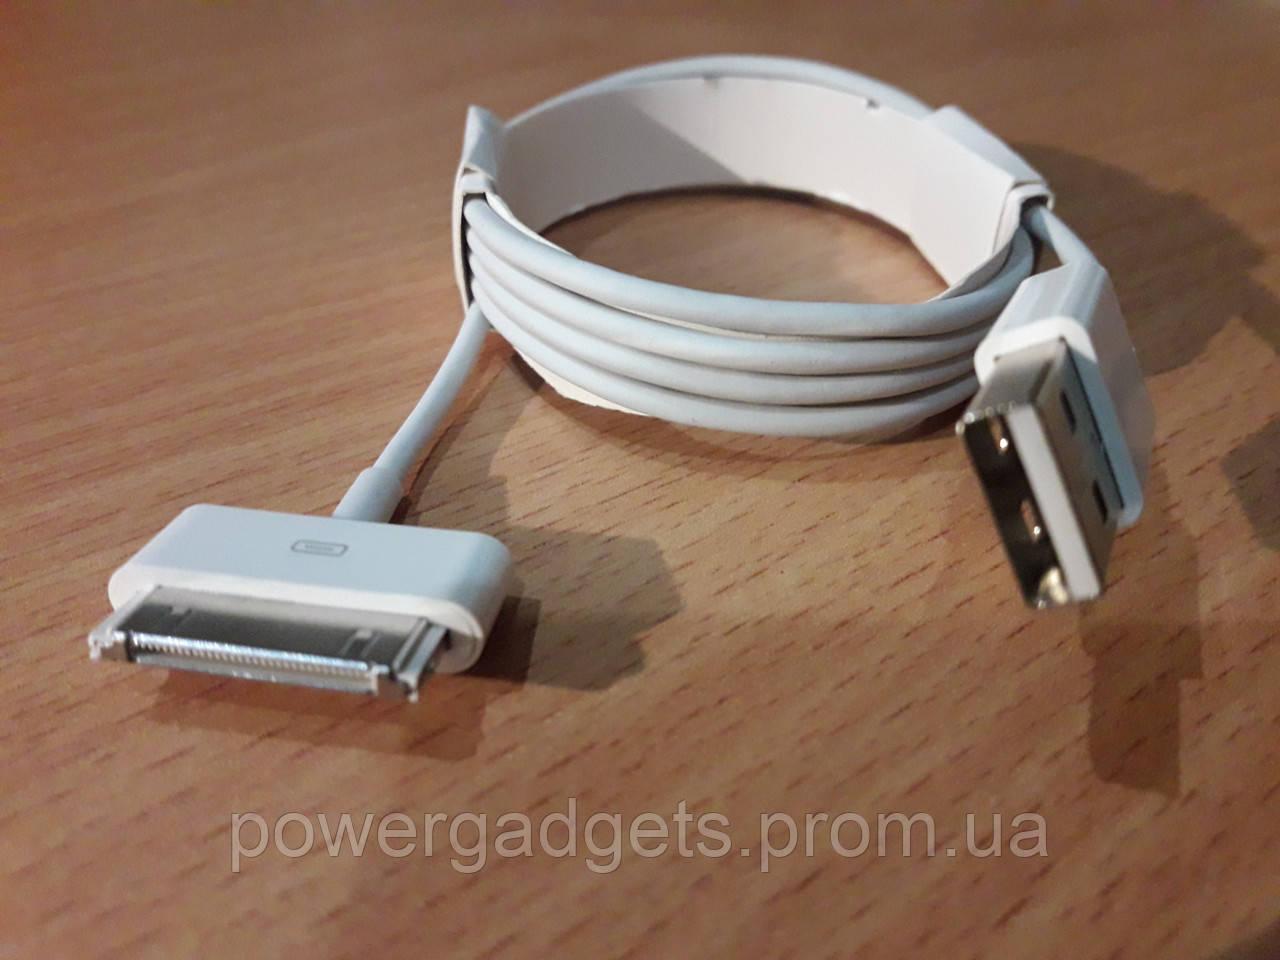 Кабель USB Apple 30-pin для iPhone, iPad, iPod, белый, Original